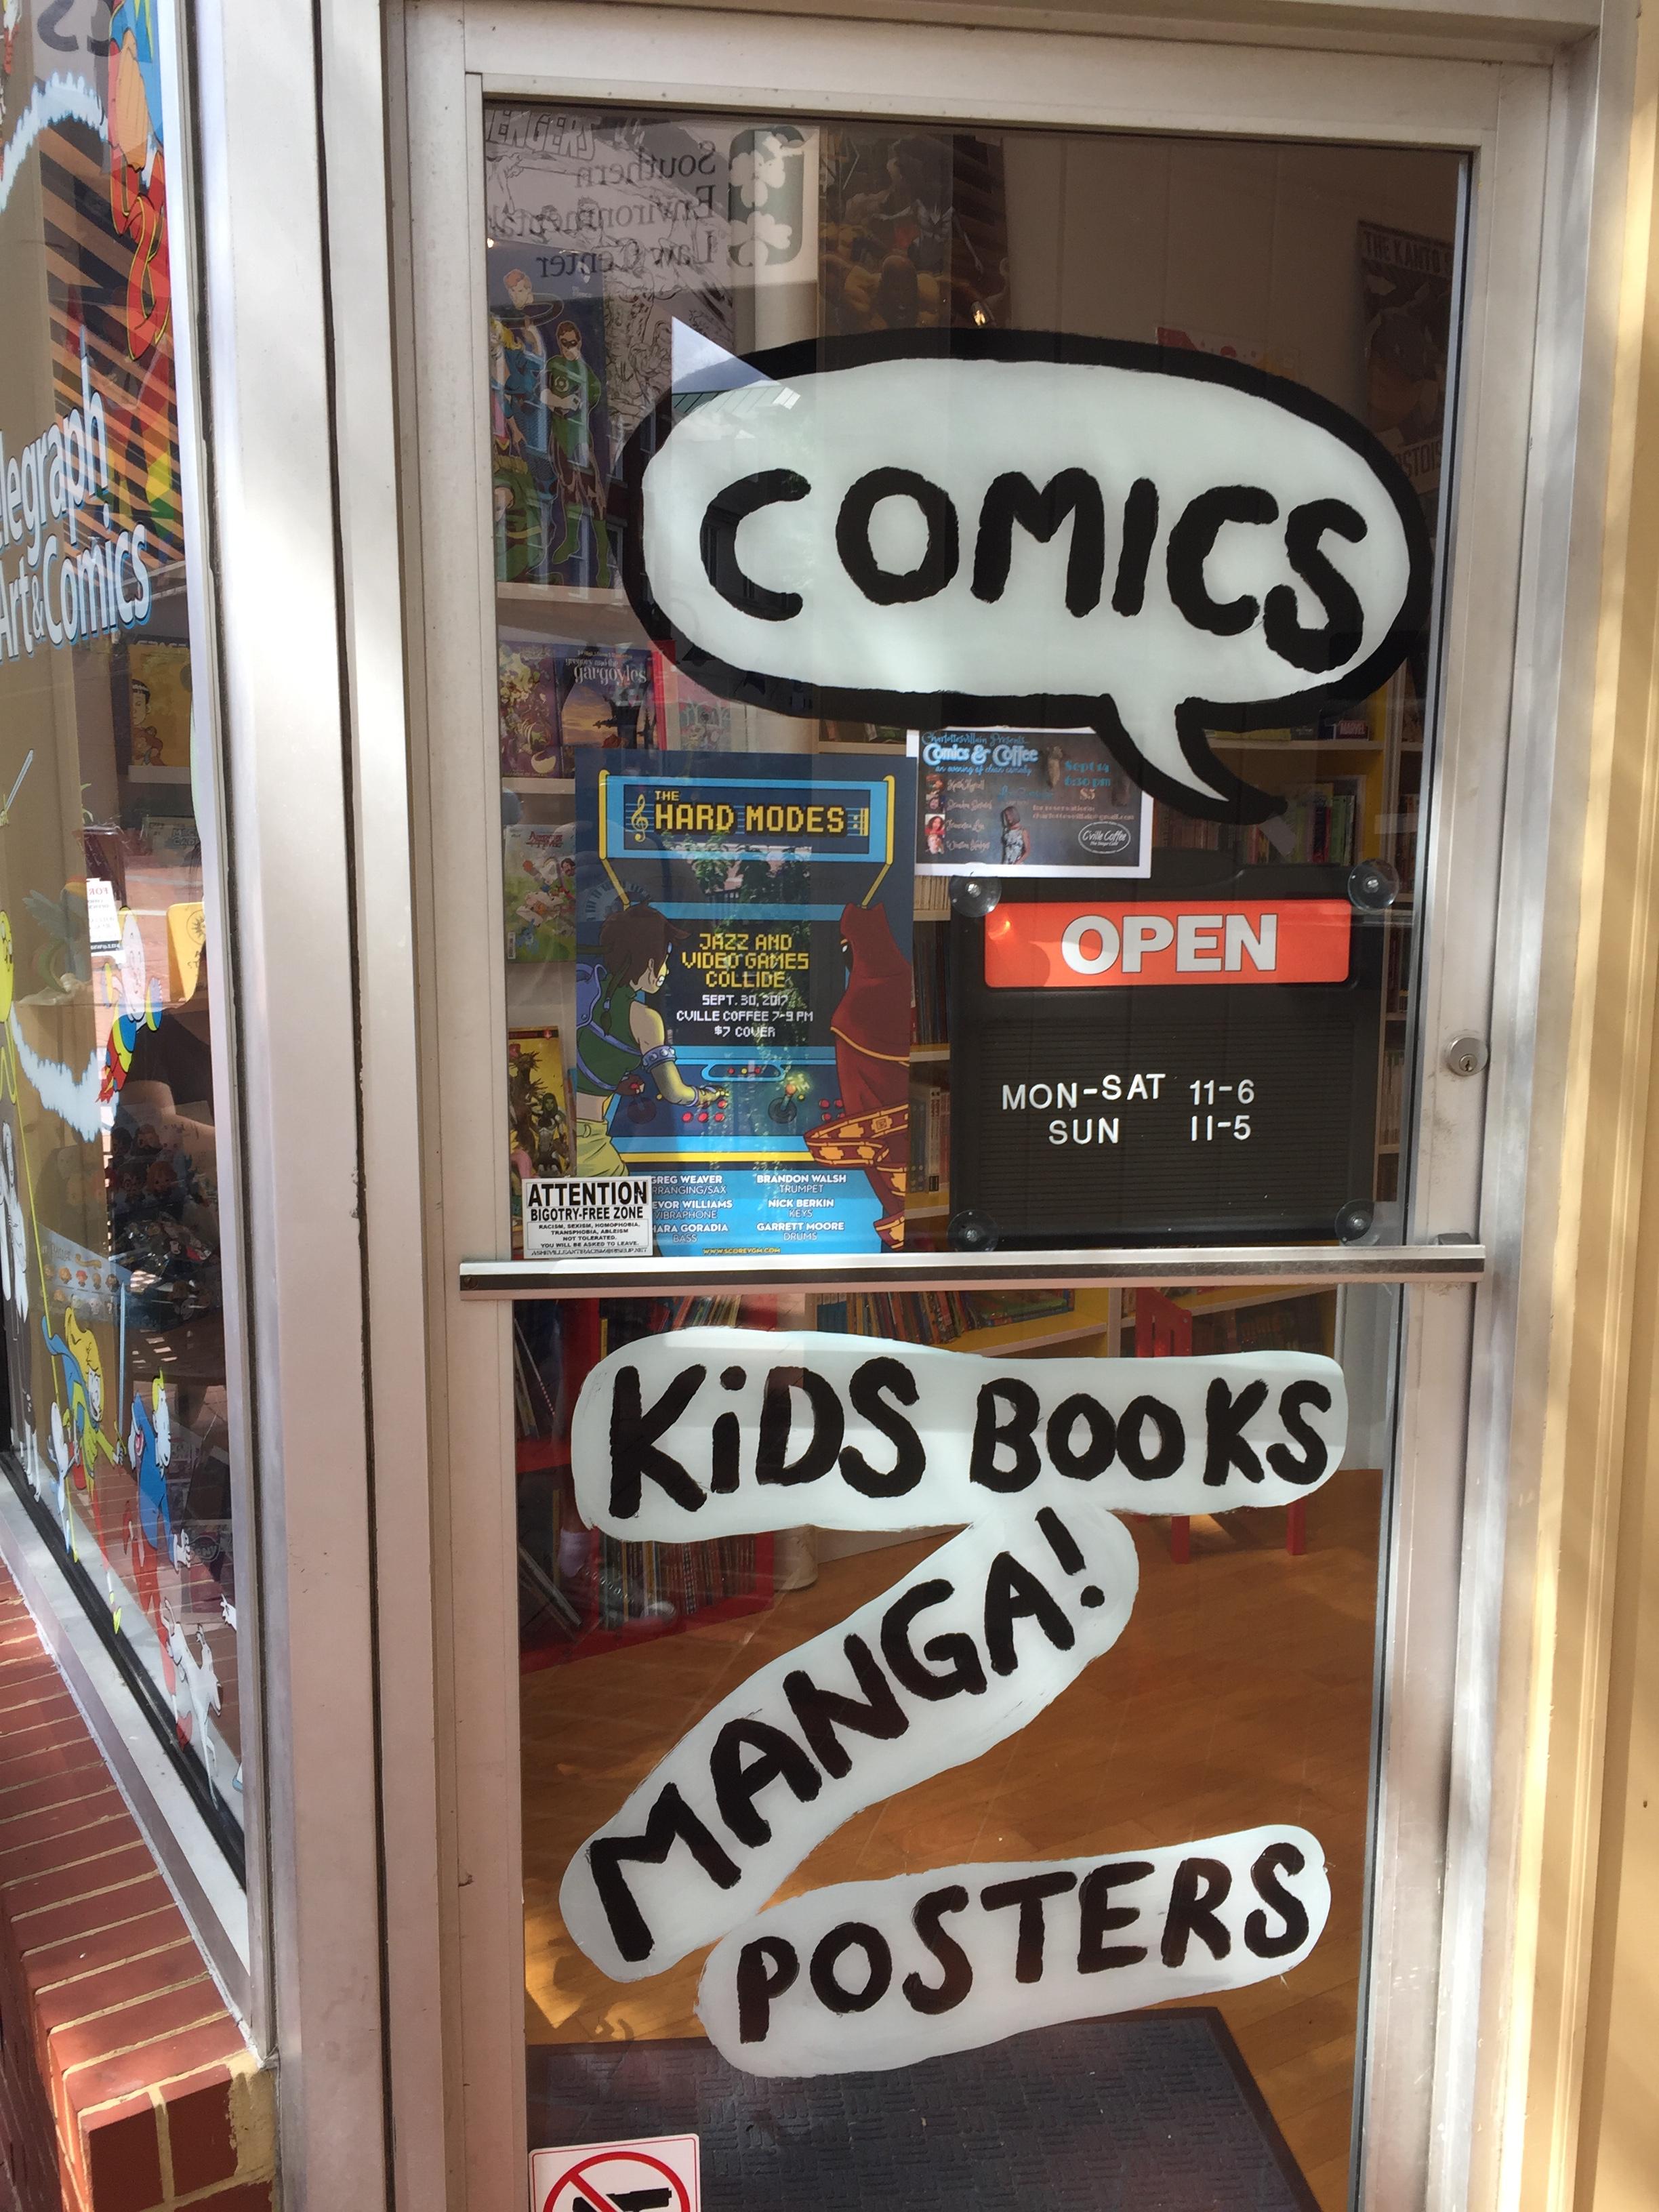 On display at Telegraph Comics!